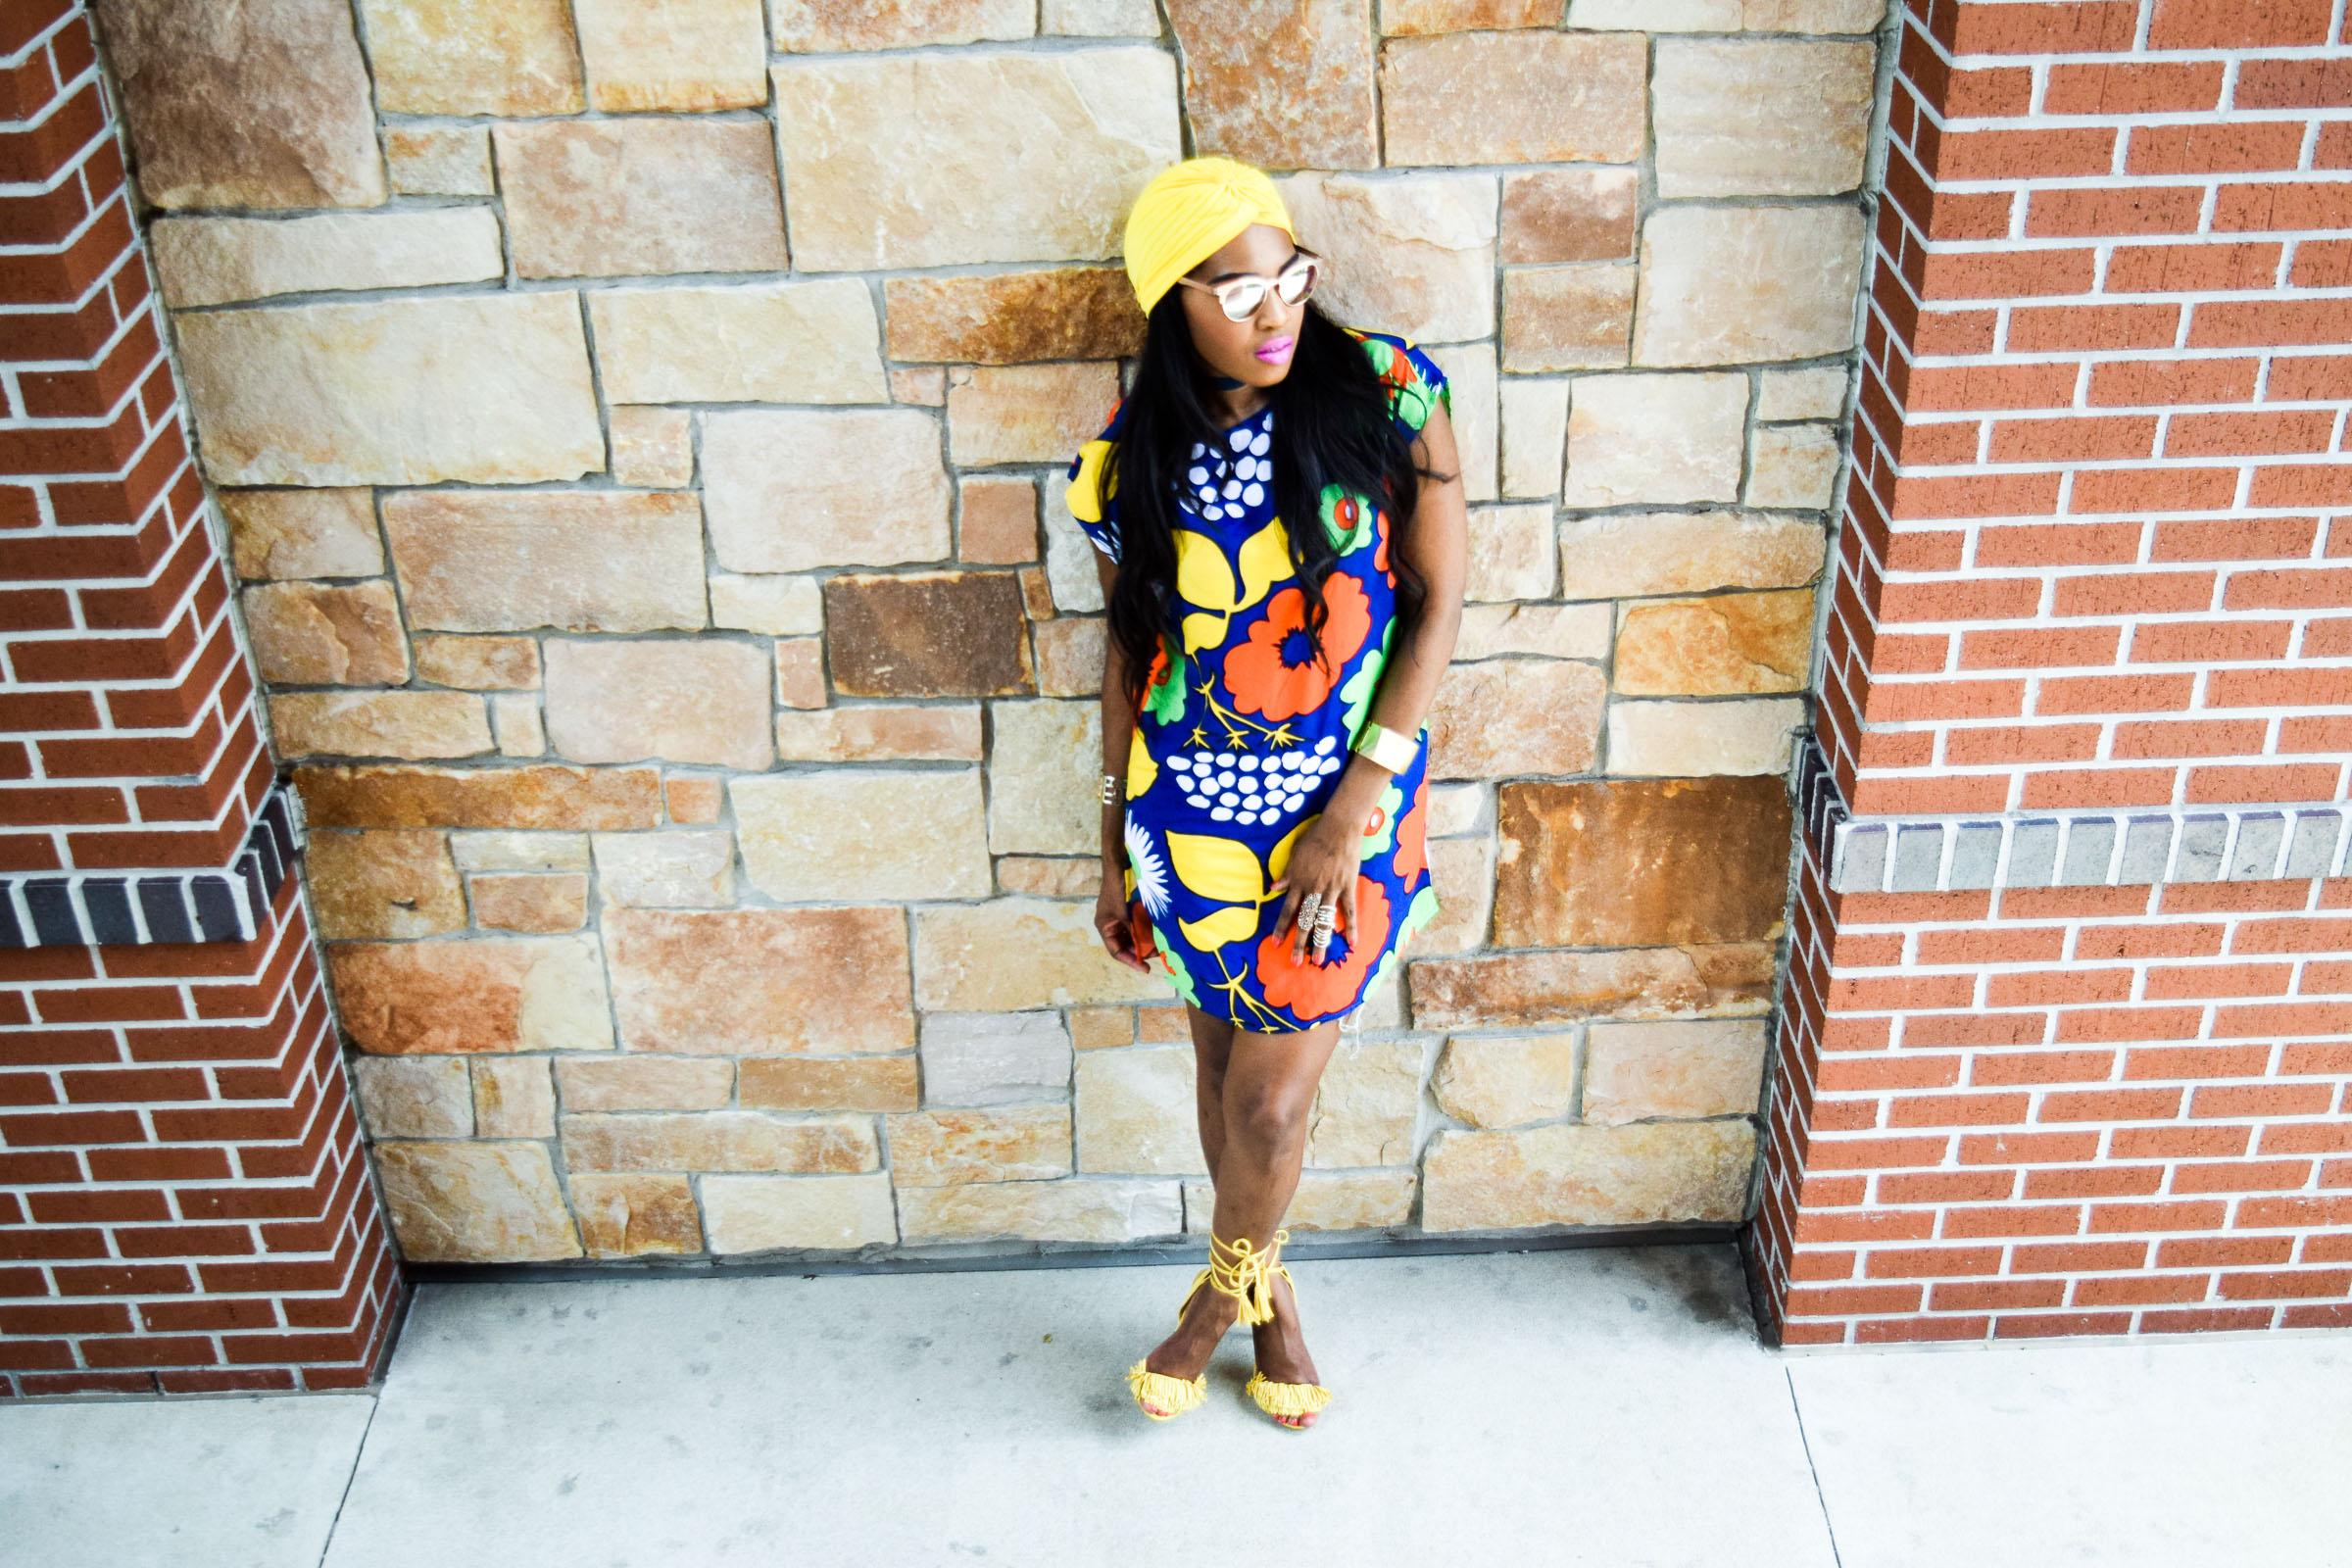 Style-Files-Target-Marimeko-collection -floral-tunic-justfab-tayrey-yellow-fringe-heels-sandals-yellow-turban-asos-denim-choker-oohlalablog-19